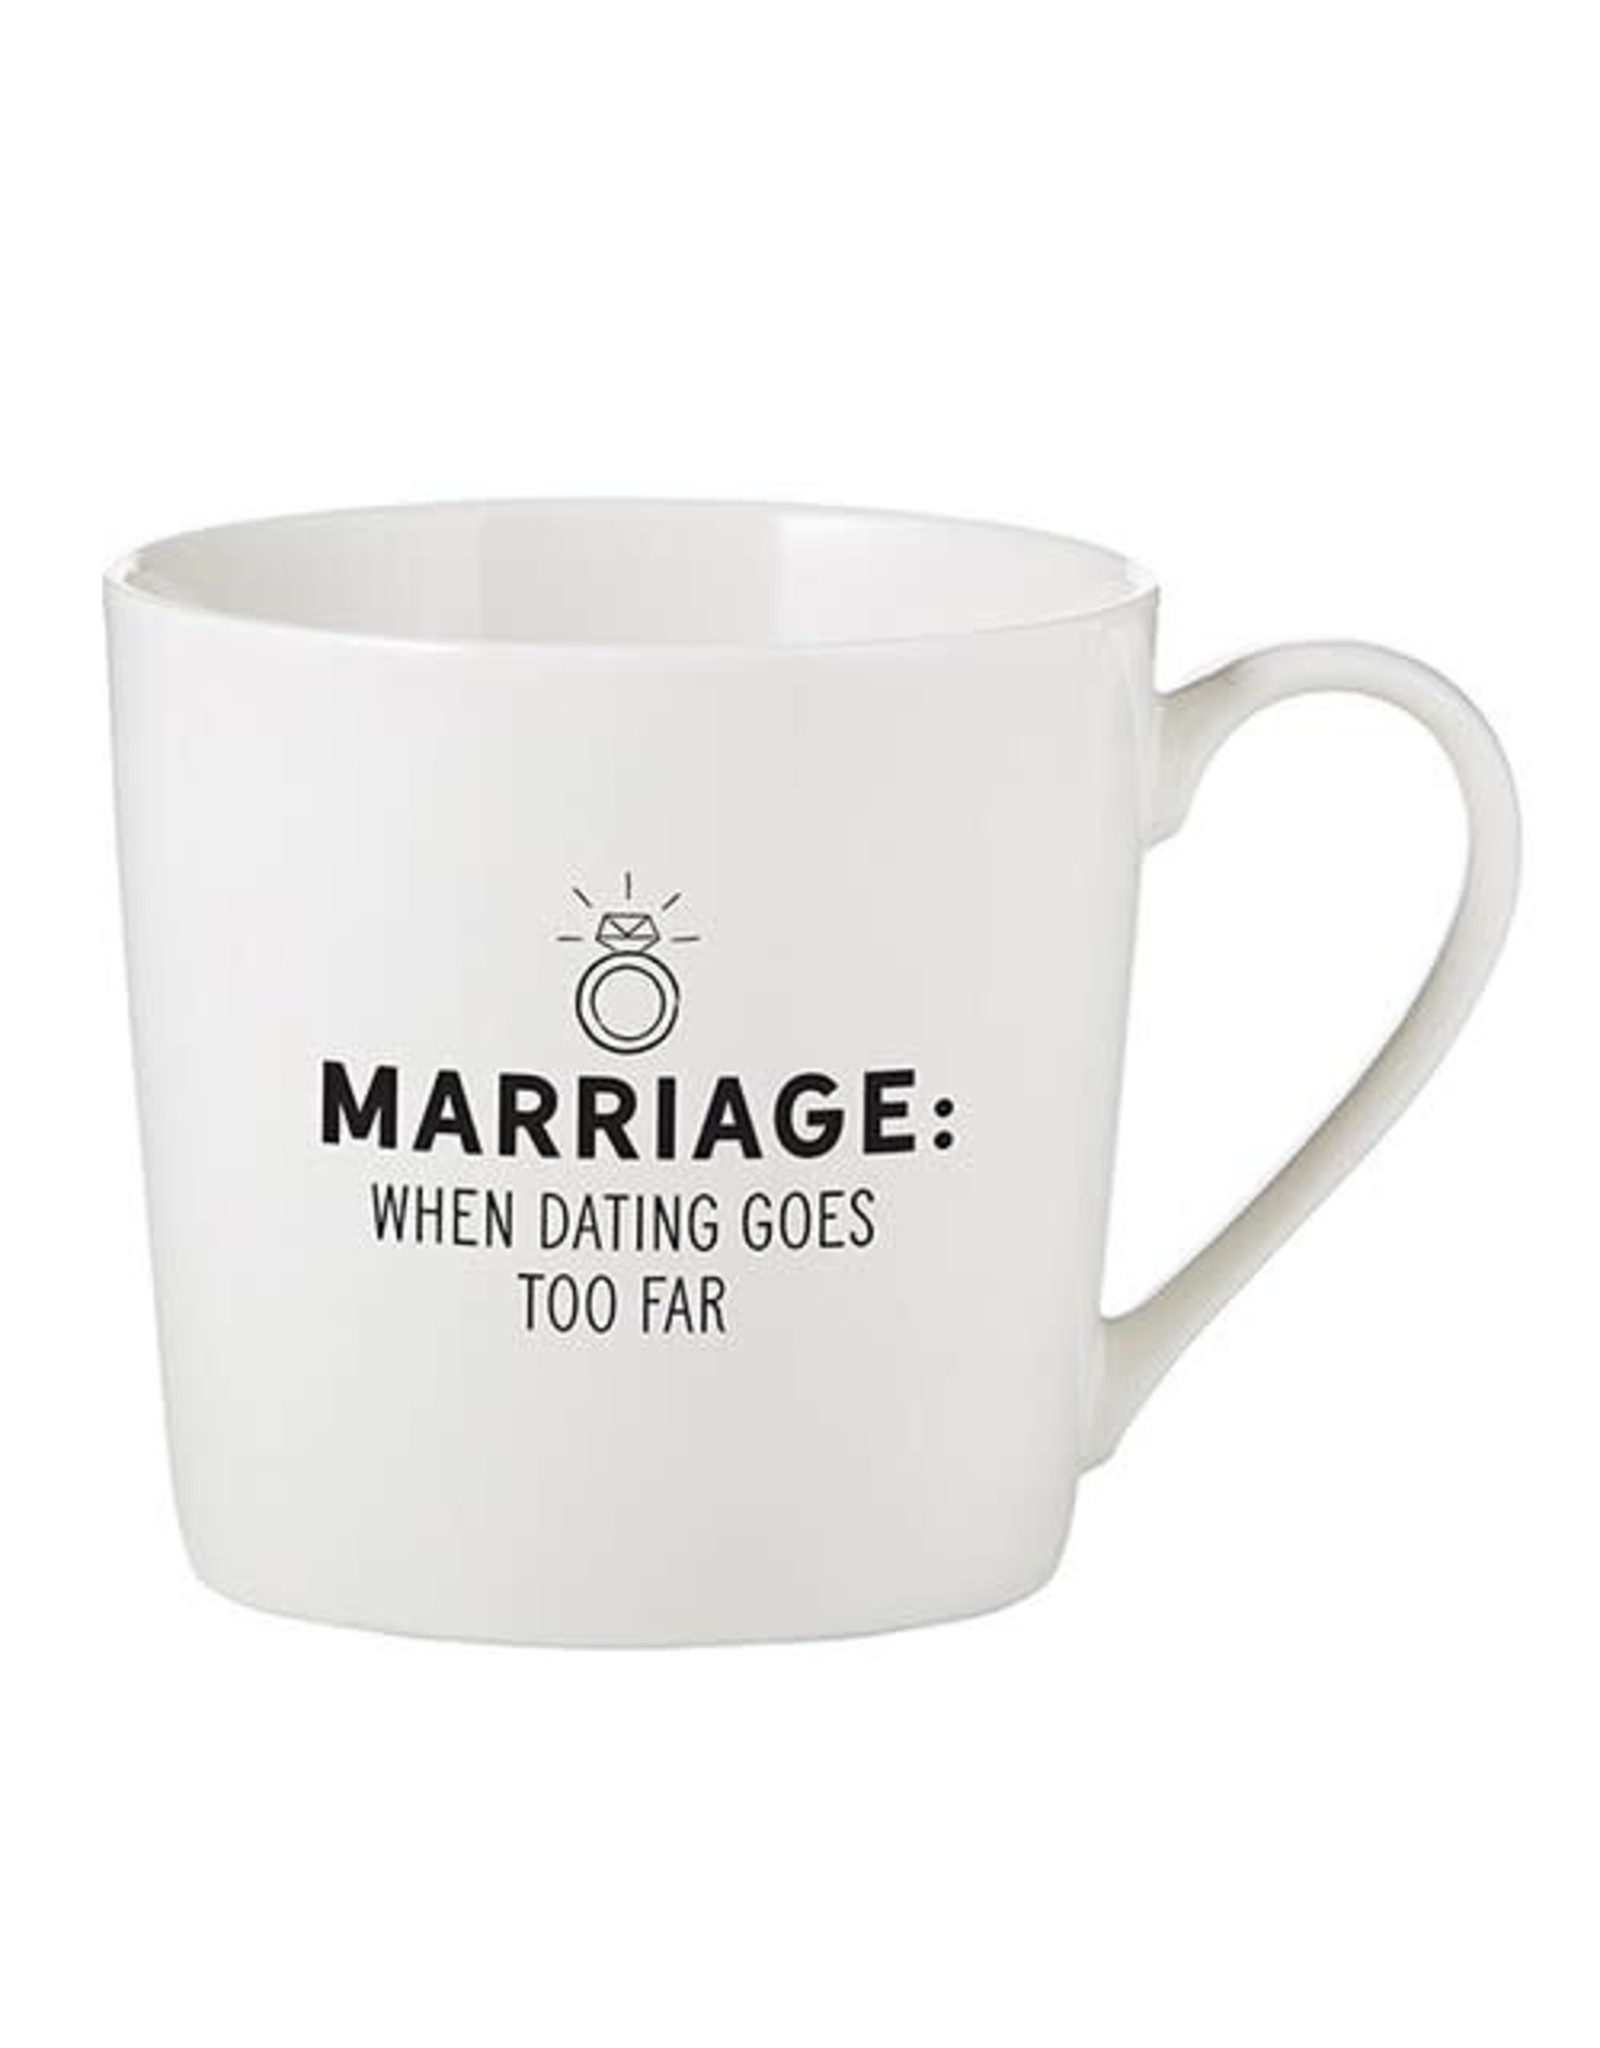 Santa Barbara Designs Café Mug - When Dating Goes Too Far